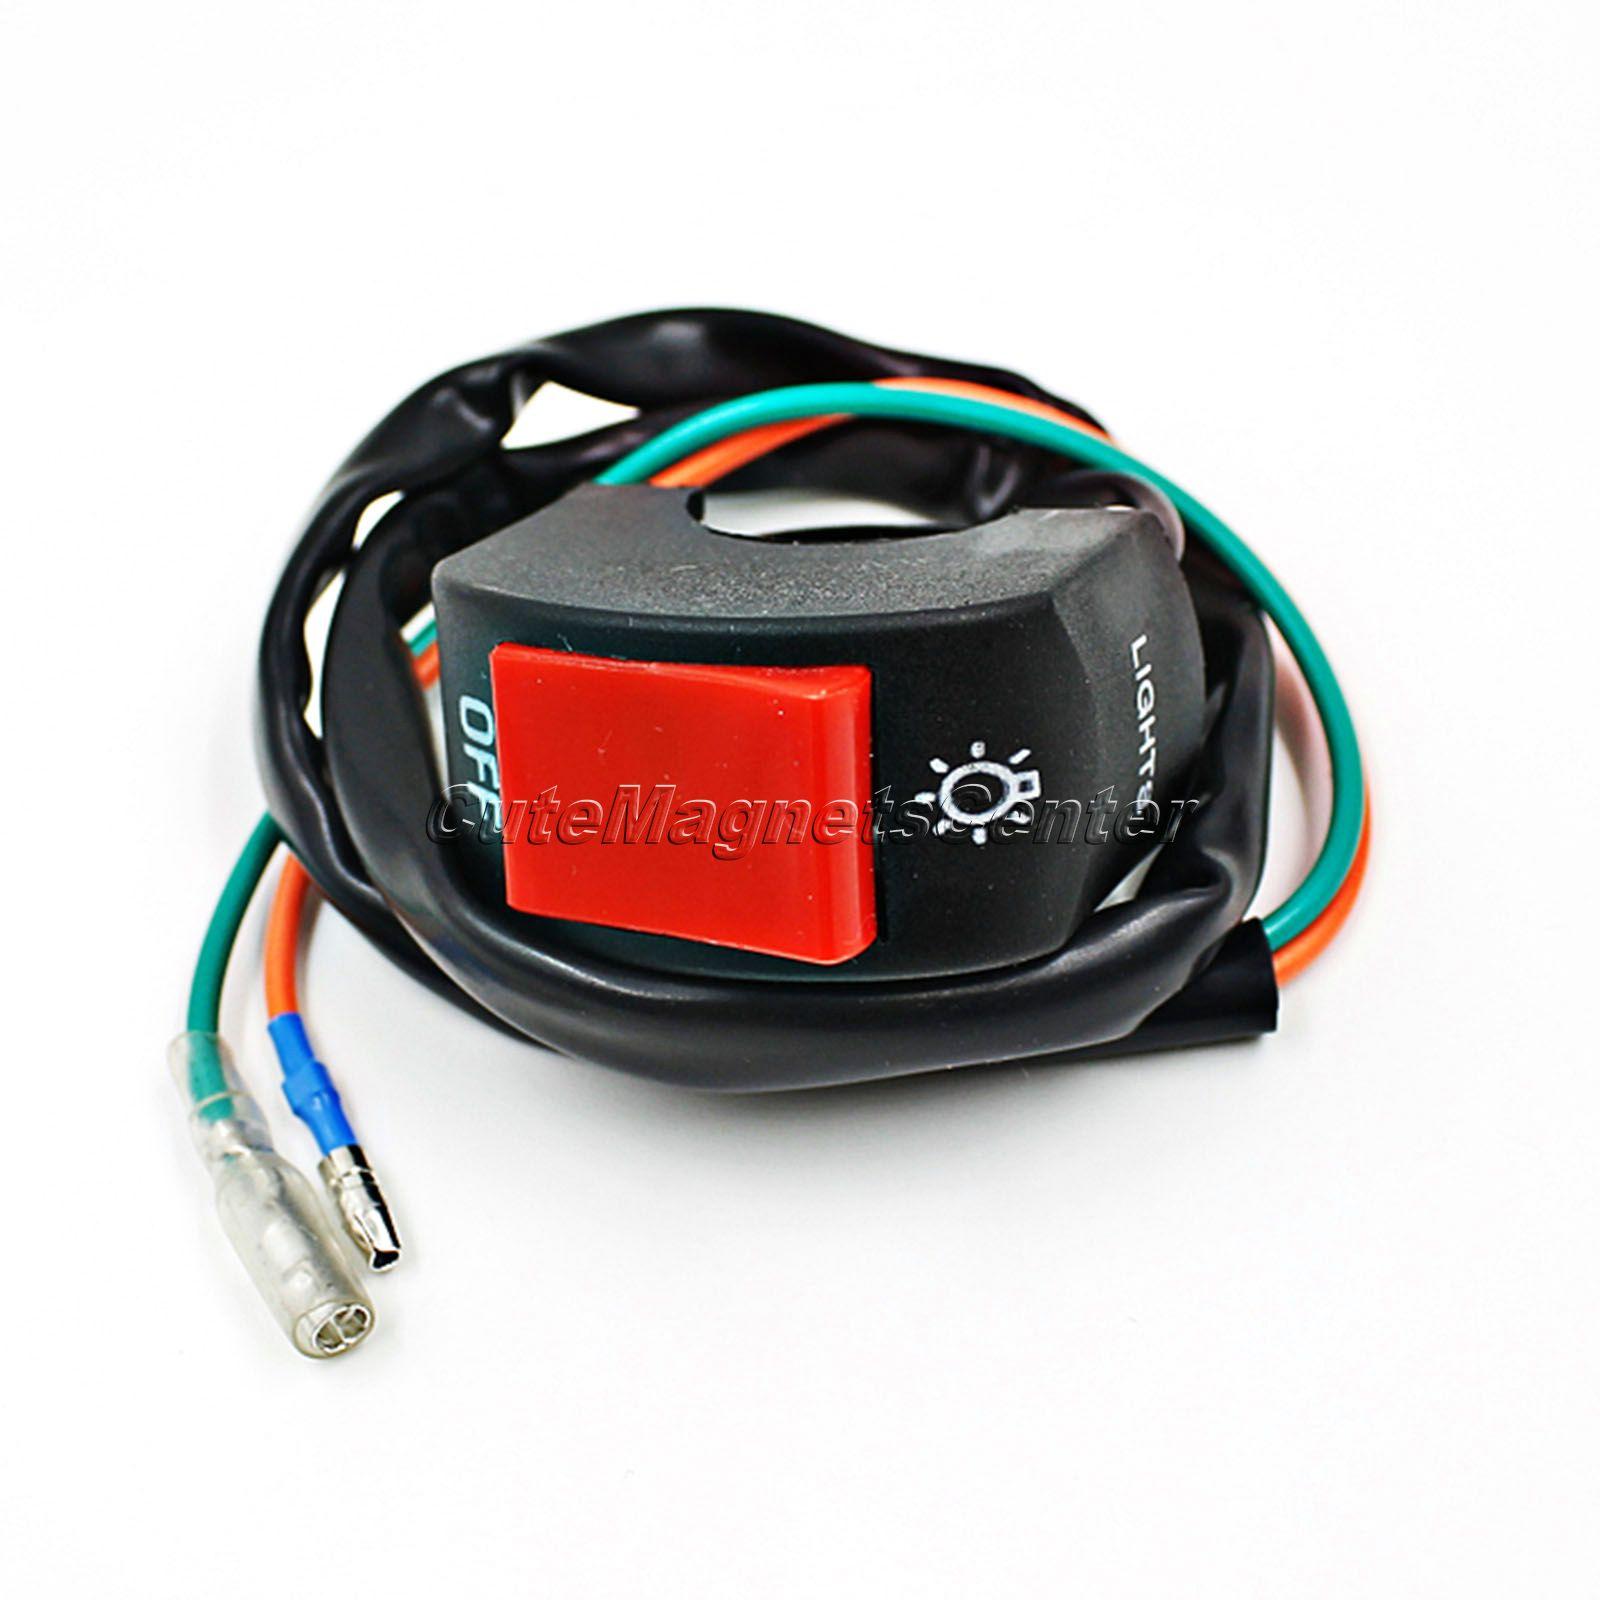 New 1pc Universal 12v Dc Motorcycle Handlebar Accident Hazard Light Wiring Brake Switch 7 8 Headlight On Off Button Bullet